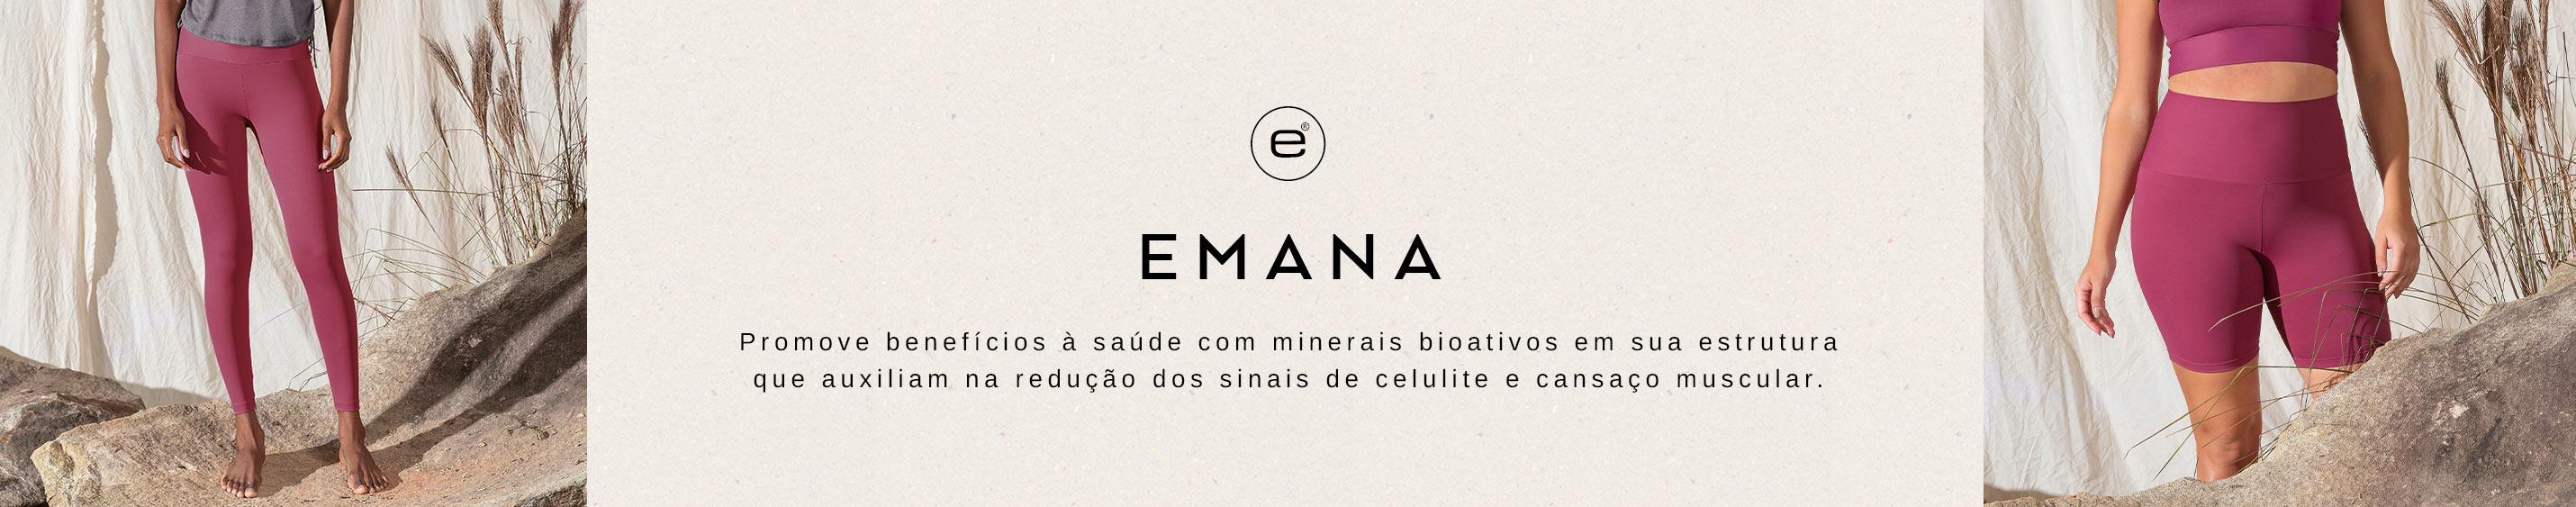 banner_emana